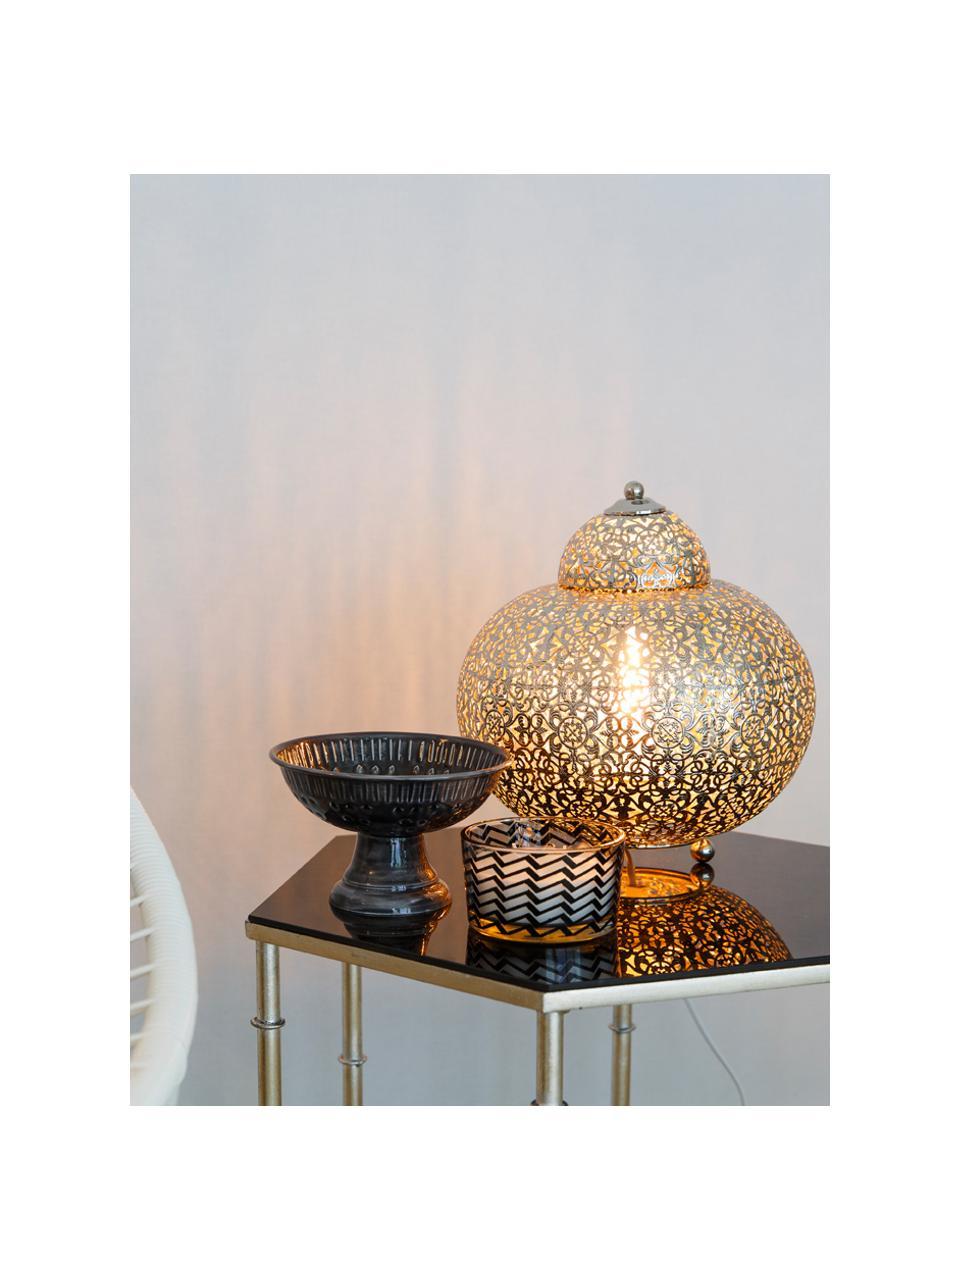 Lampe à poser orientale Marocco, Nickel